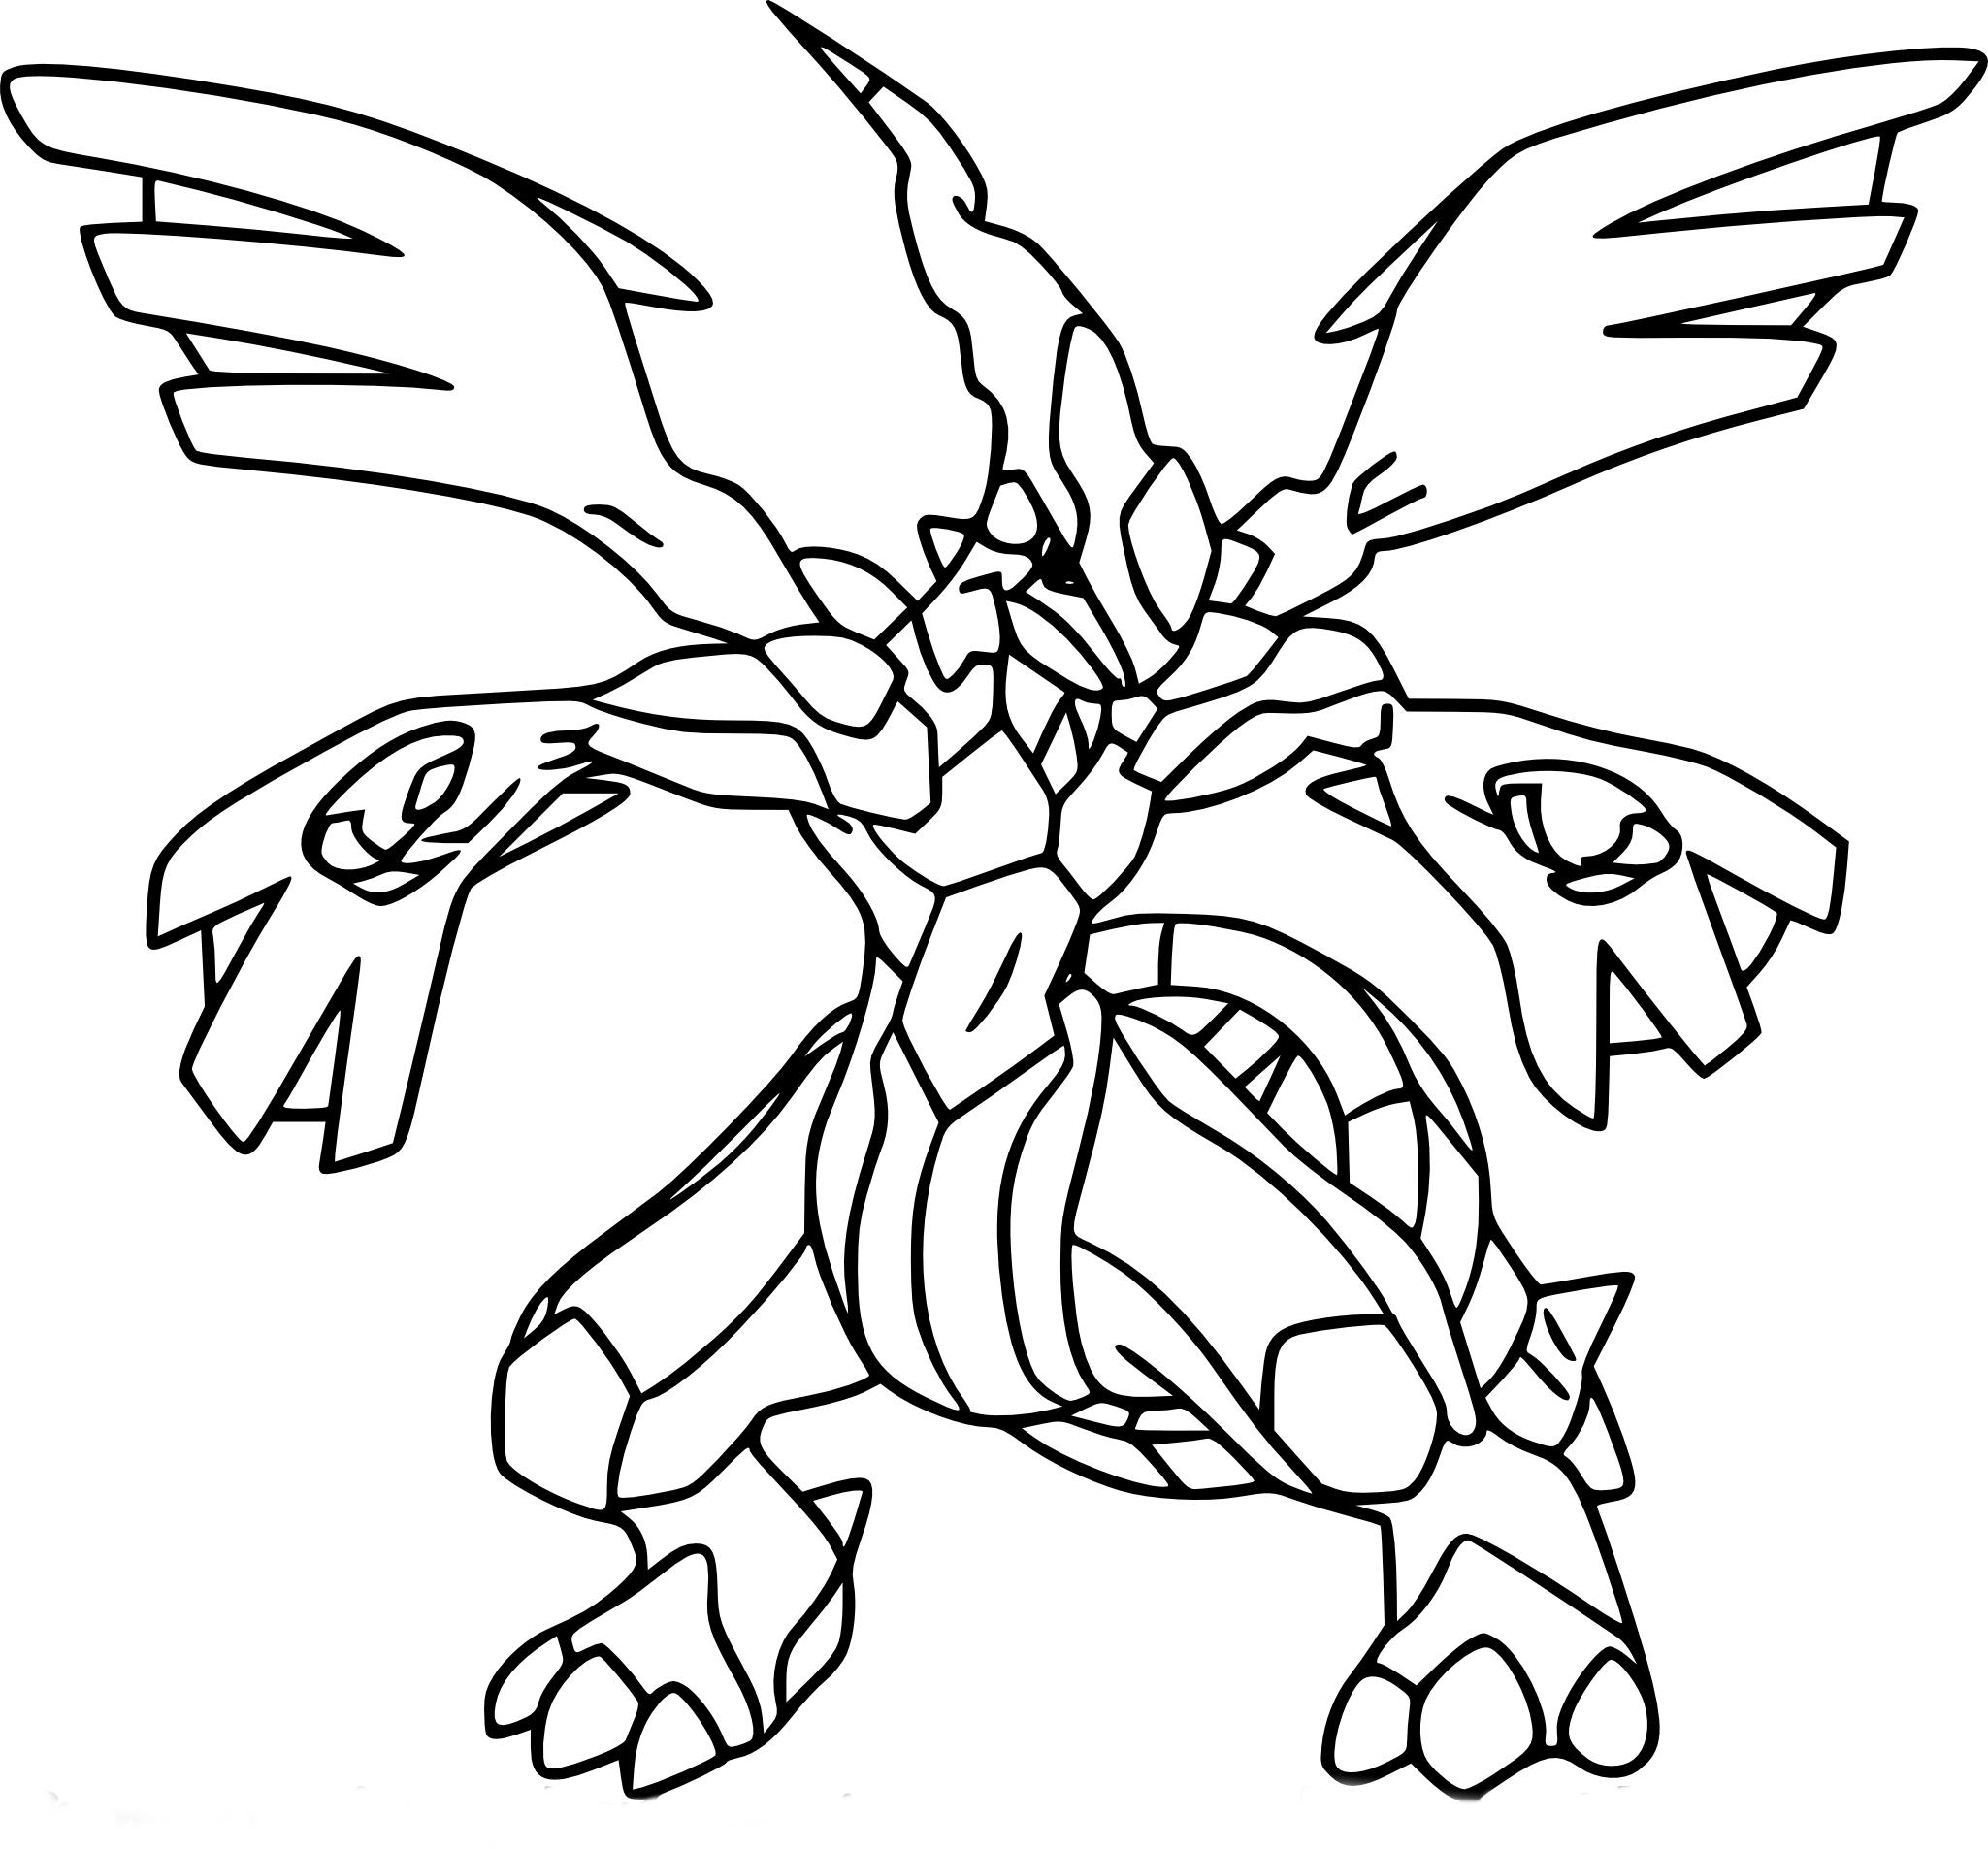 Coloriage Zekrom Pokemon A Imprimer